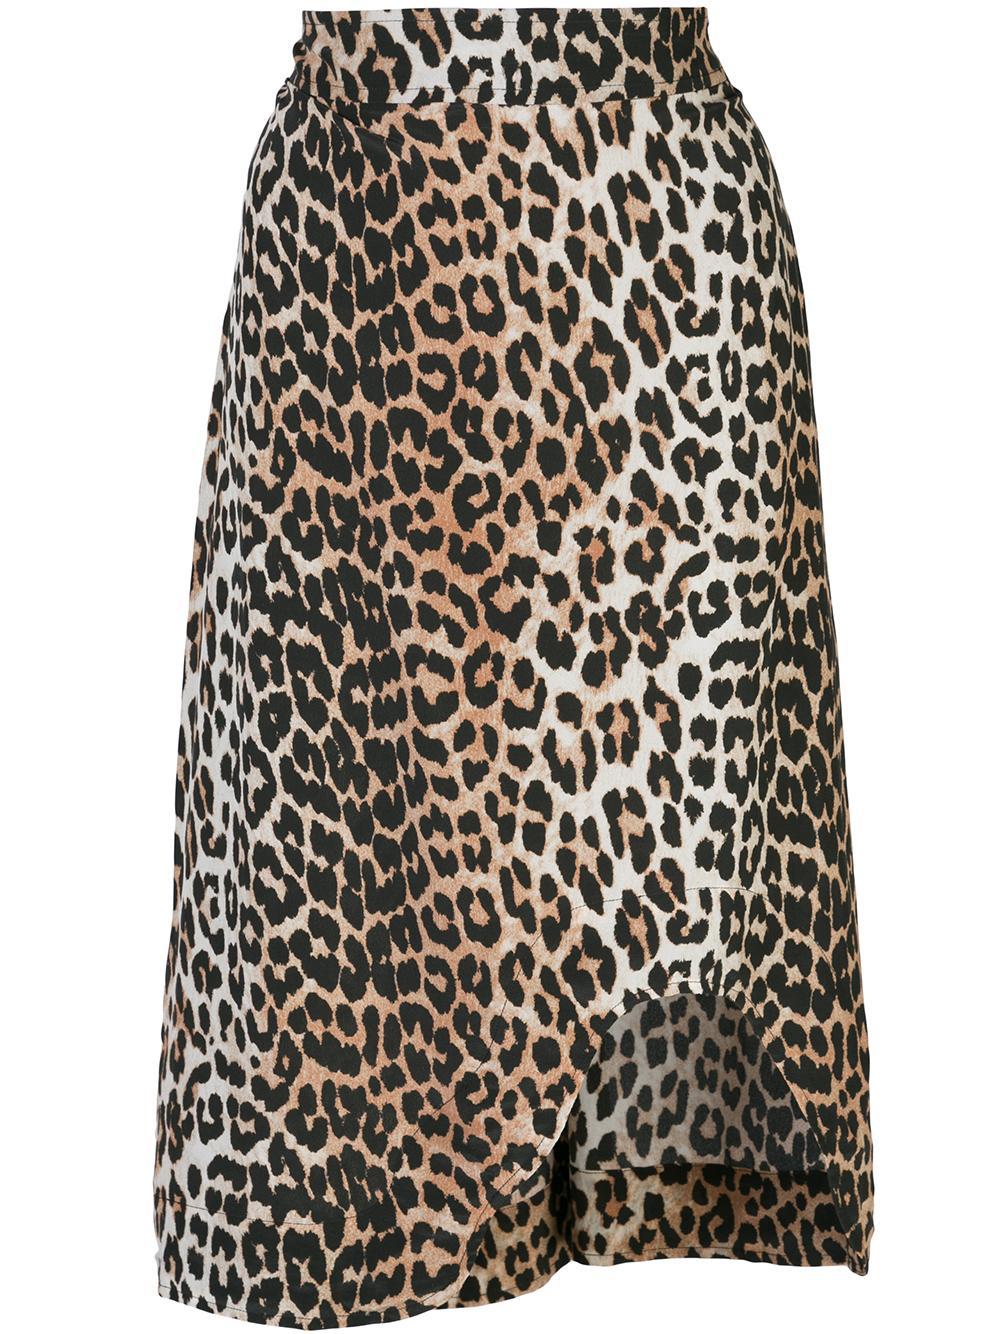 Animal Print Silk Mix Pencil Skirt Item # F3888